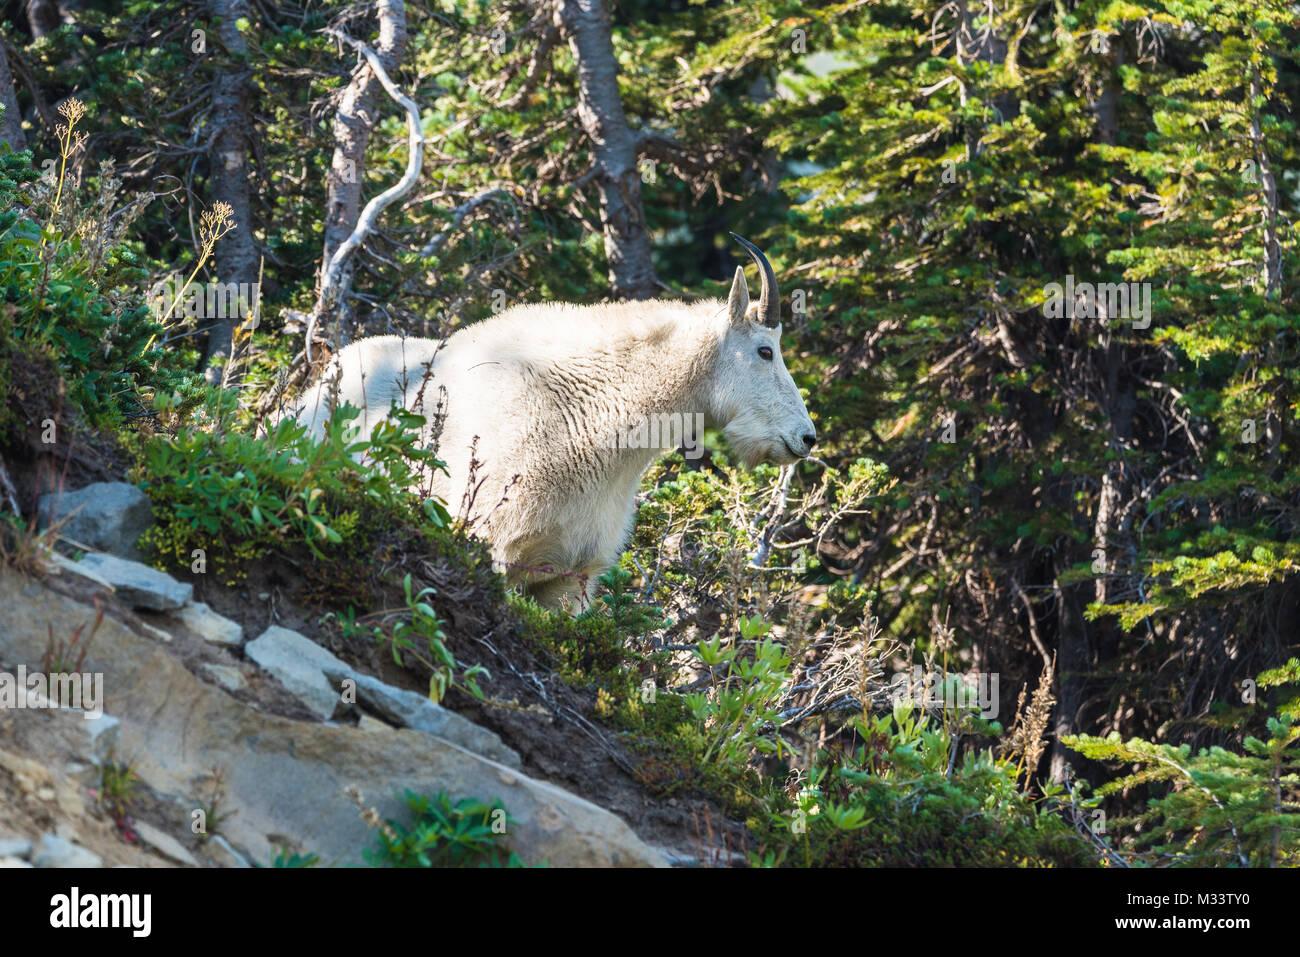 Stoic mountain goat looking away - Stock Image